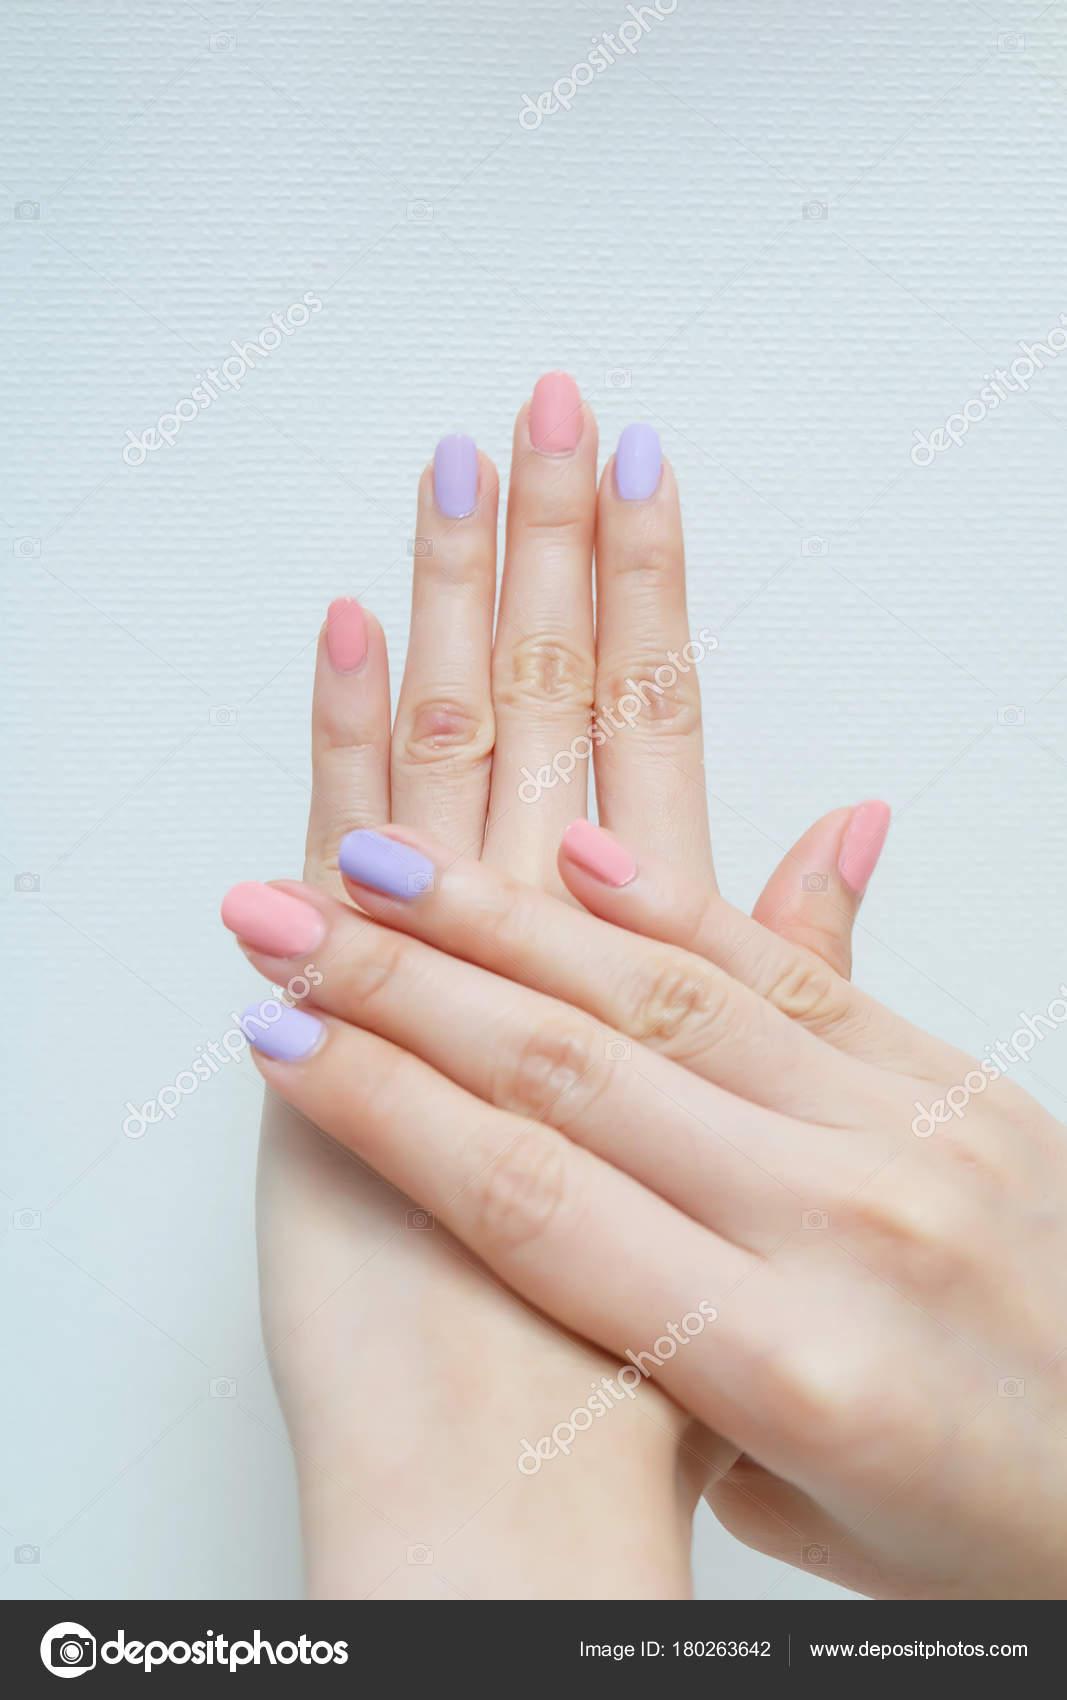 Close Nail Polish Manicure Beautiful Woman Hands Pink Violet